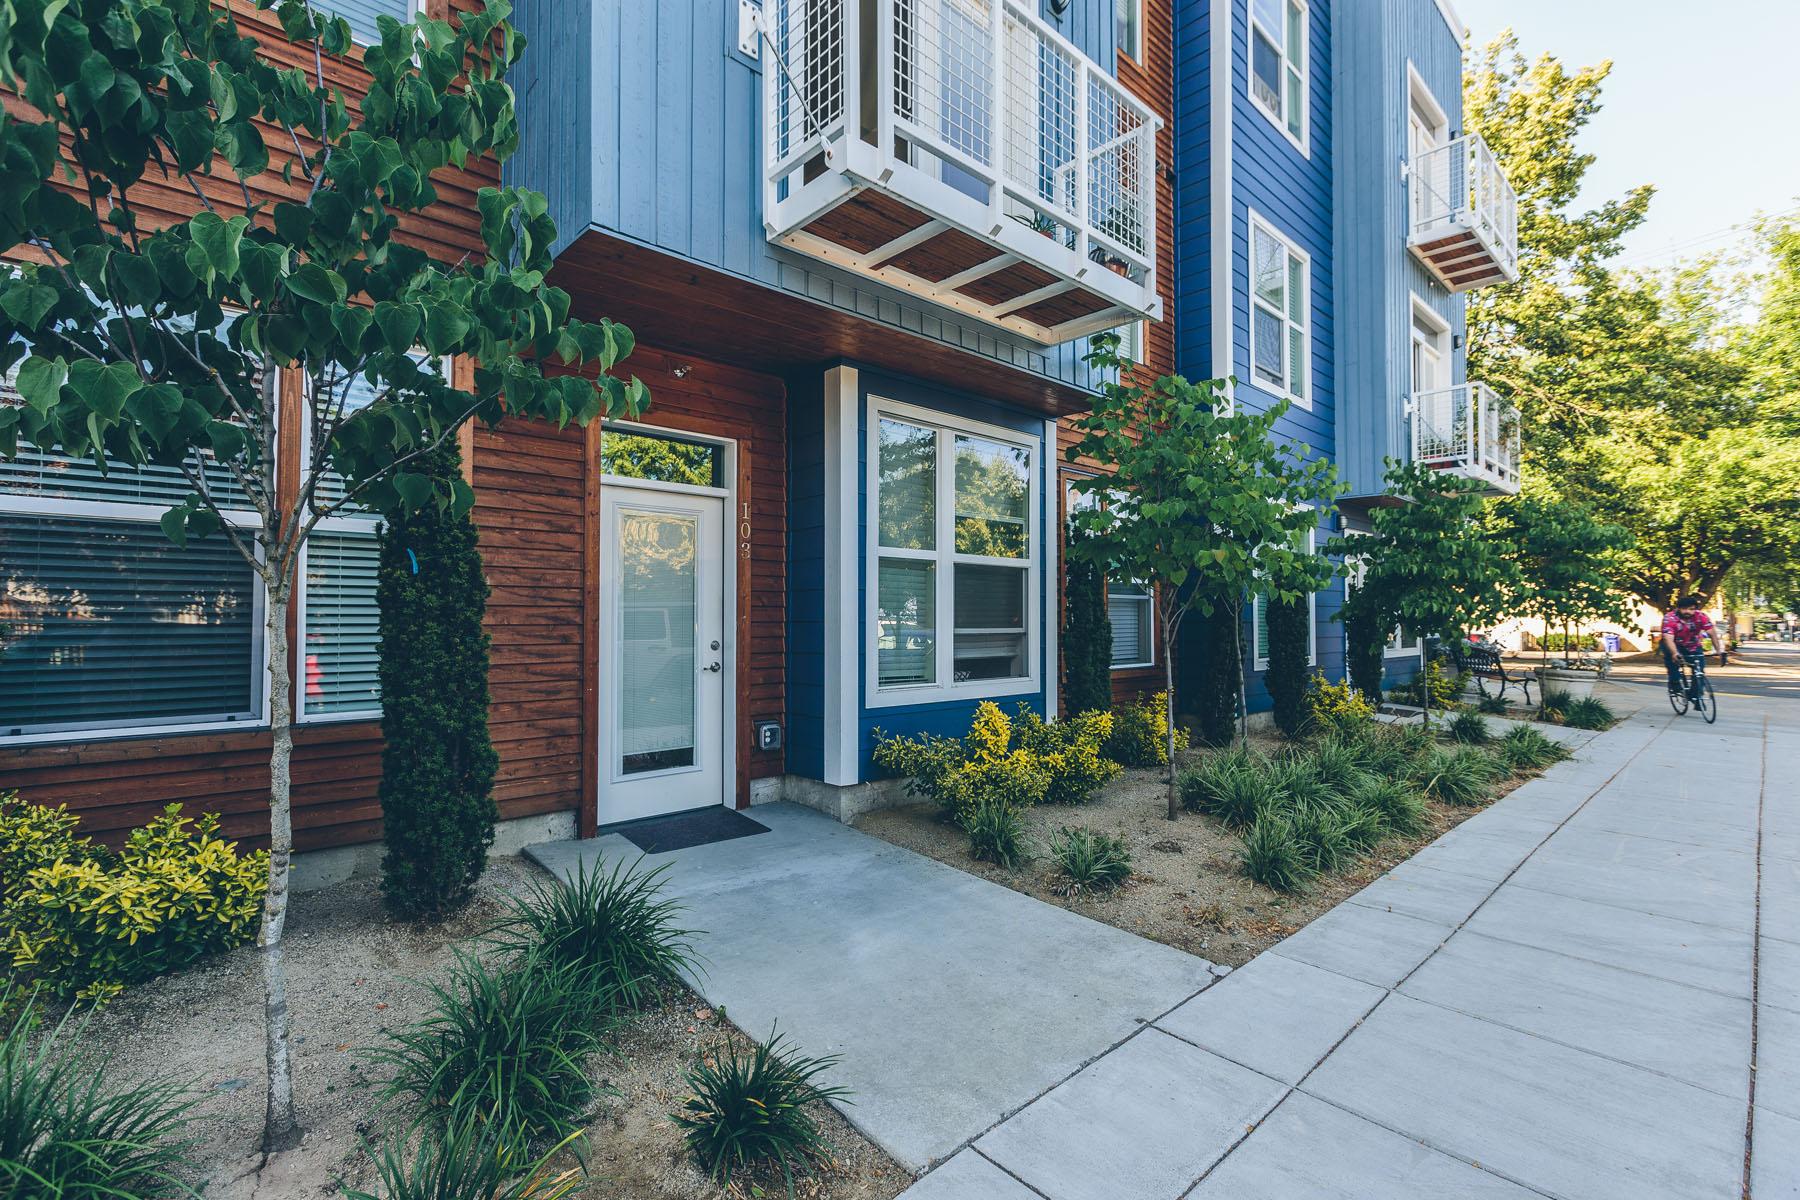 ekoliving-property-ivanhoe-05.jpg